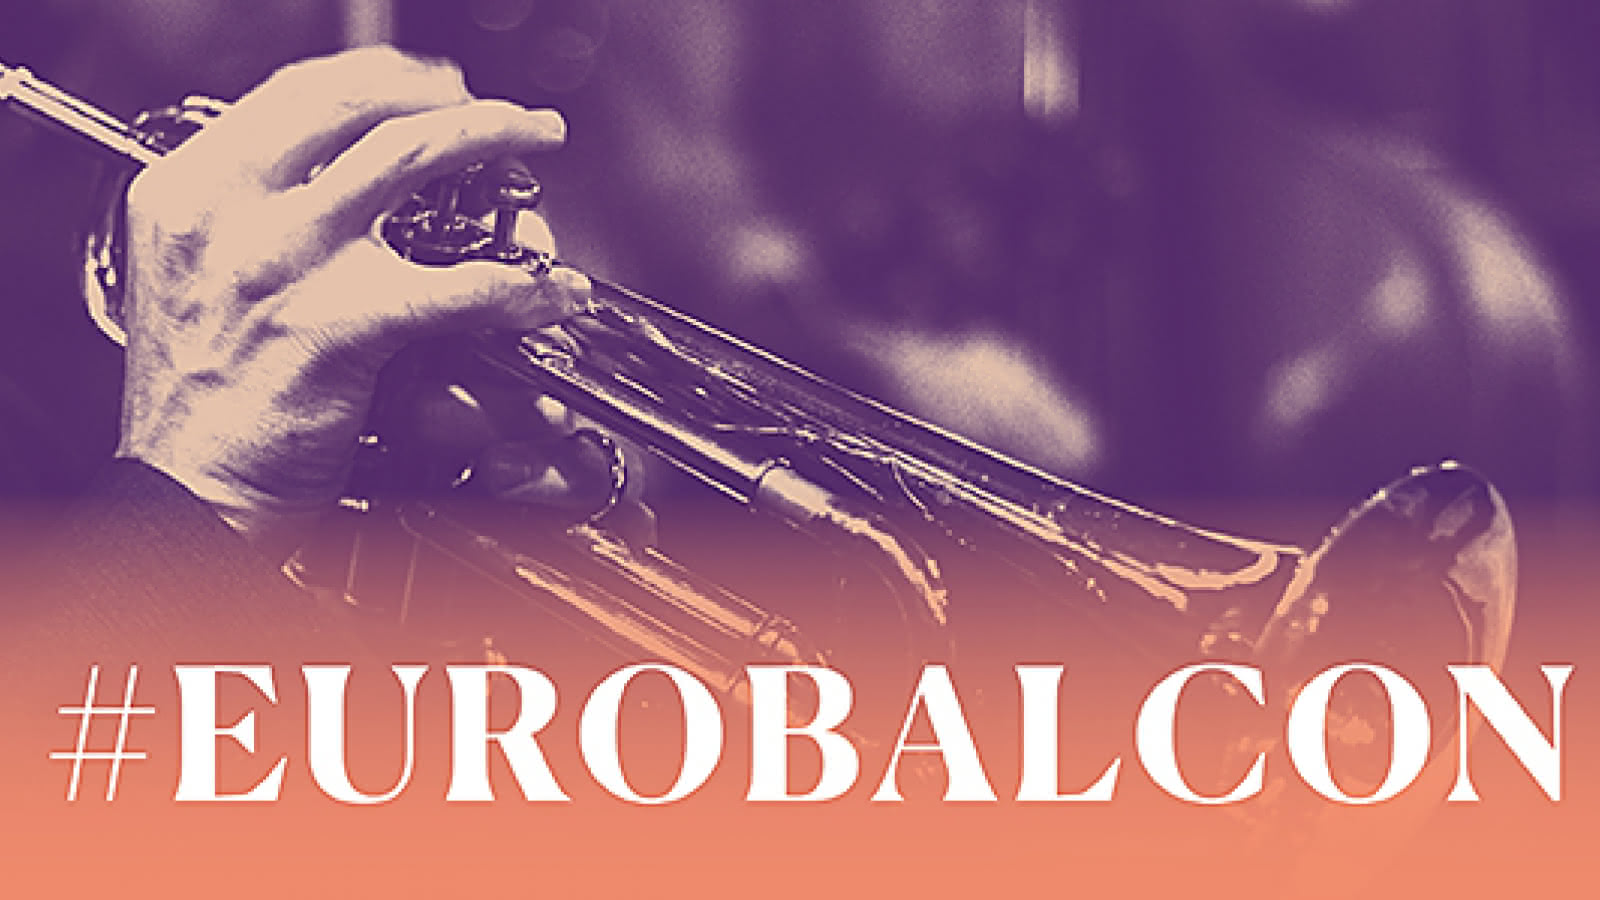 Bandeau visuel de la communication de la campagne Eurobalcon